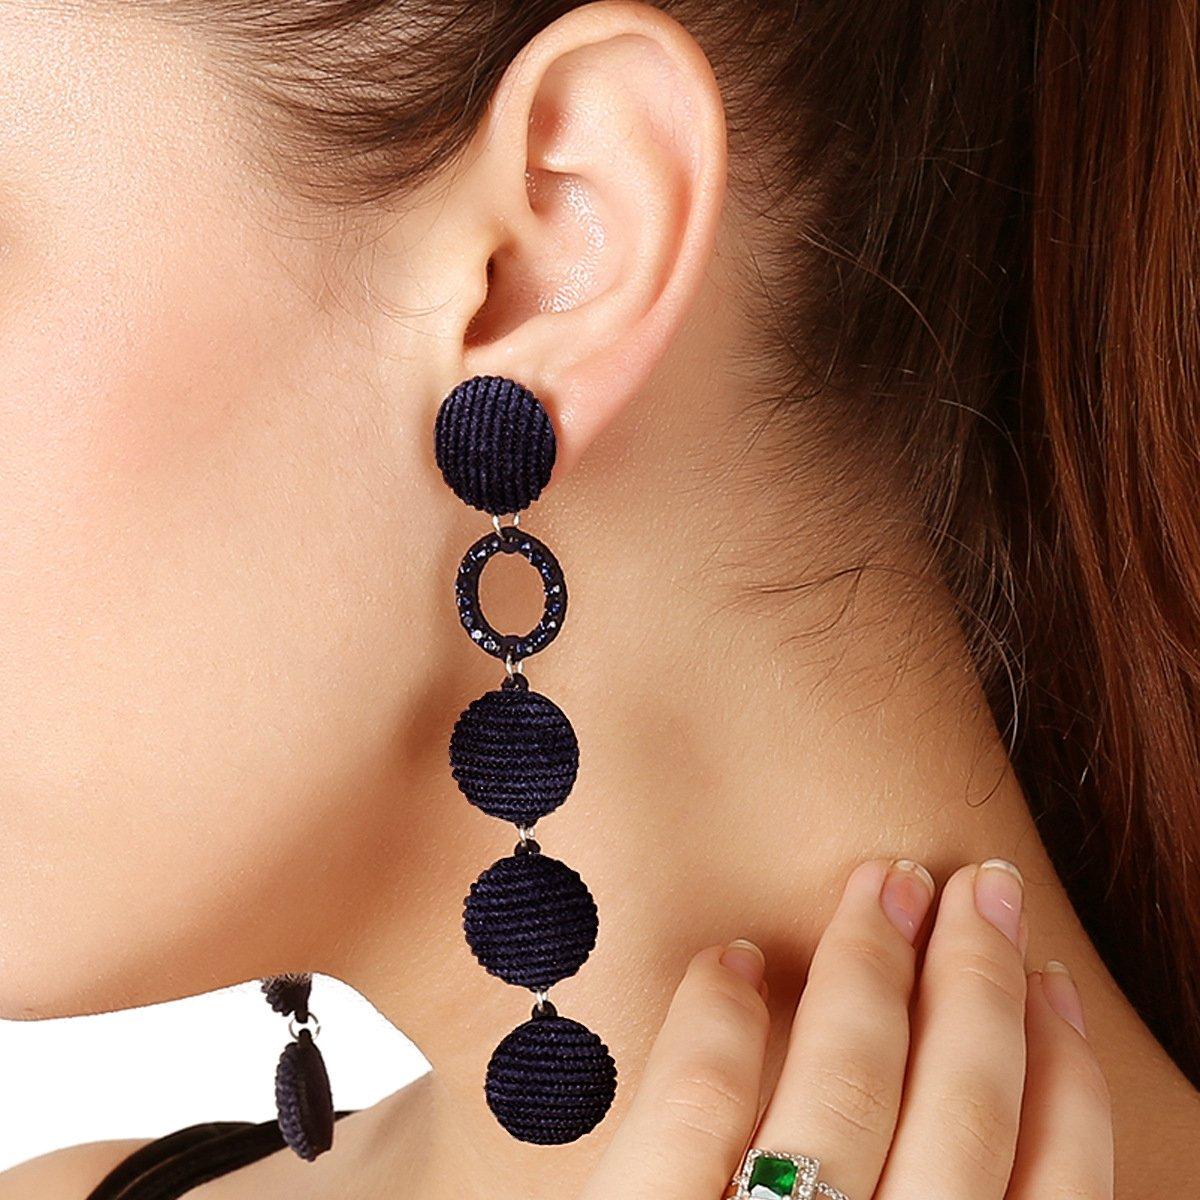 Aukmla Long Thread Fringe Dangle Statement Drop Earrings for Women and Girls (Black)